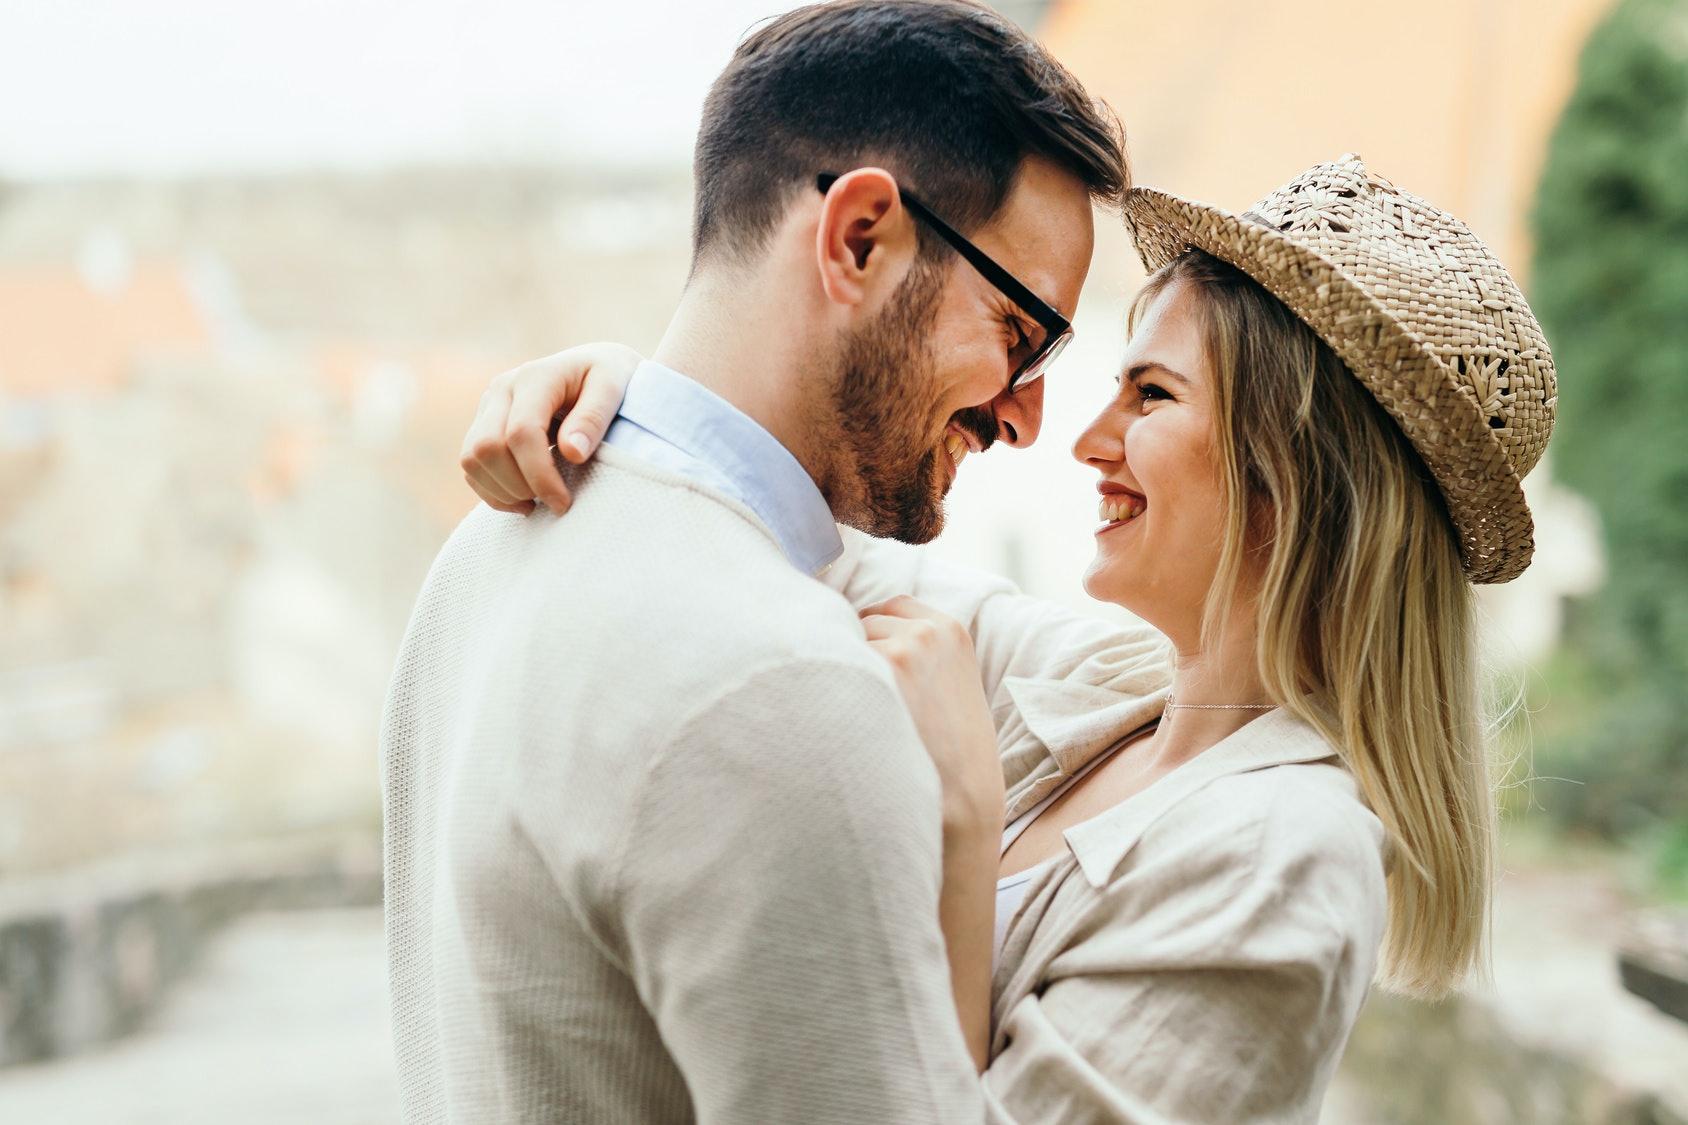 Istp women dating